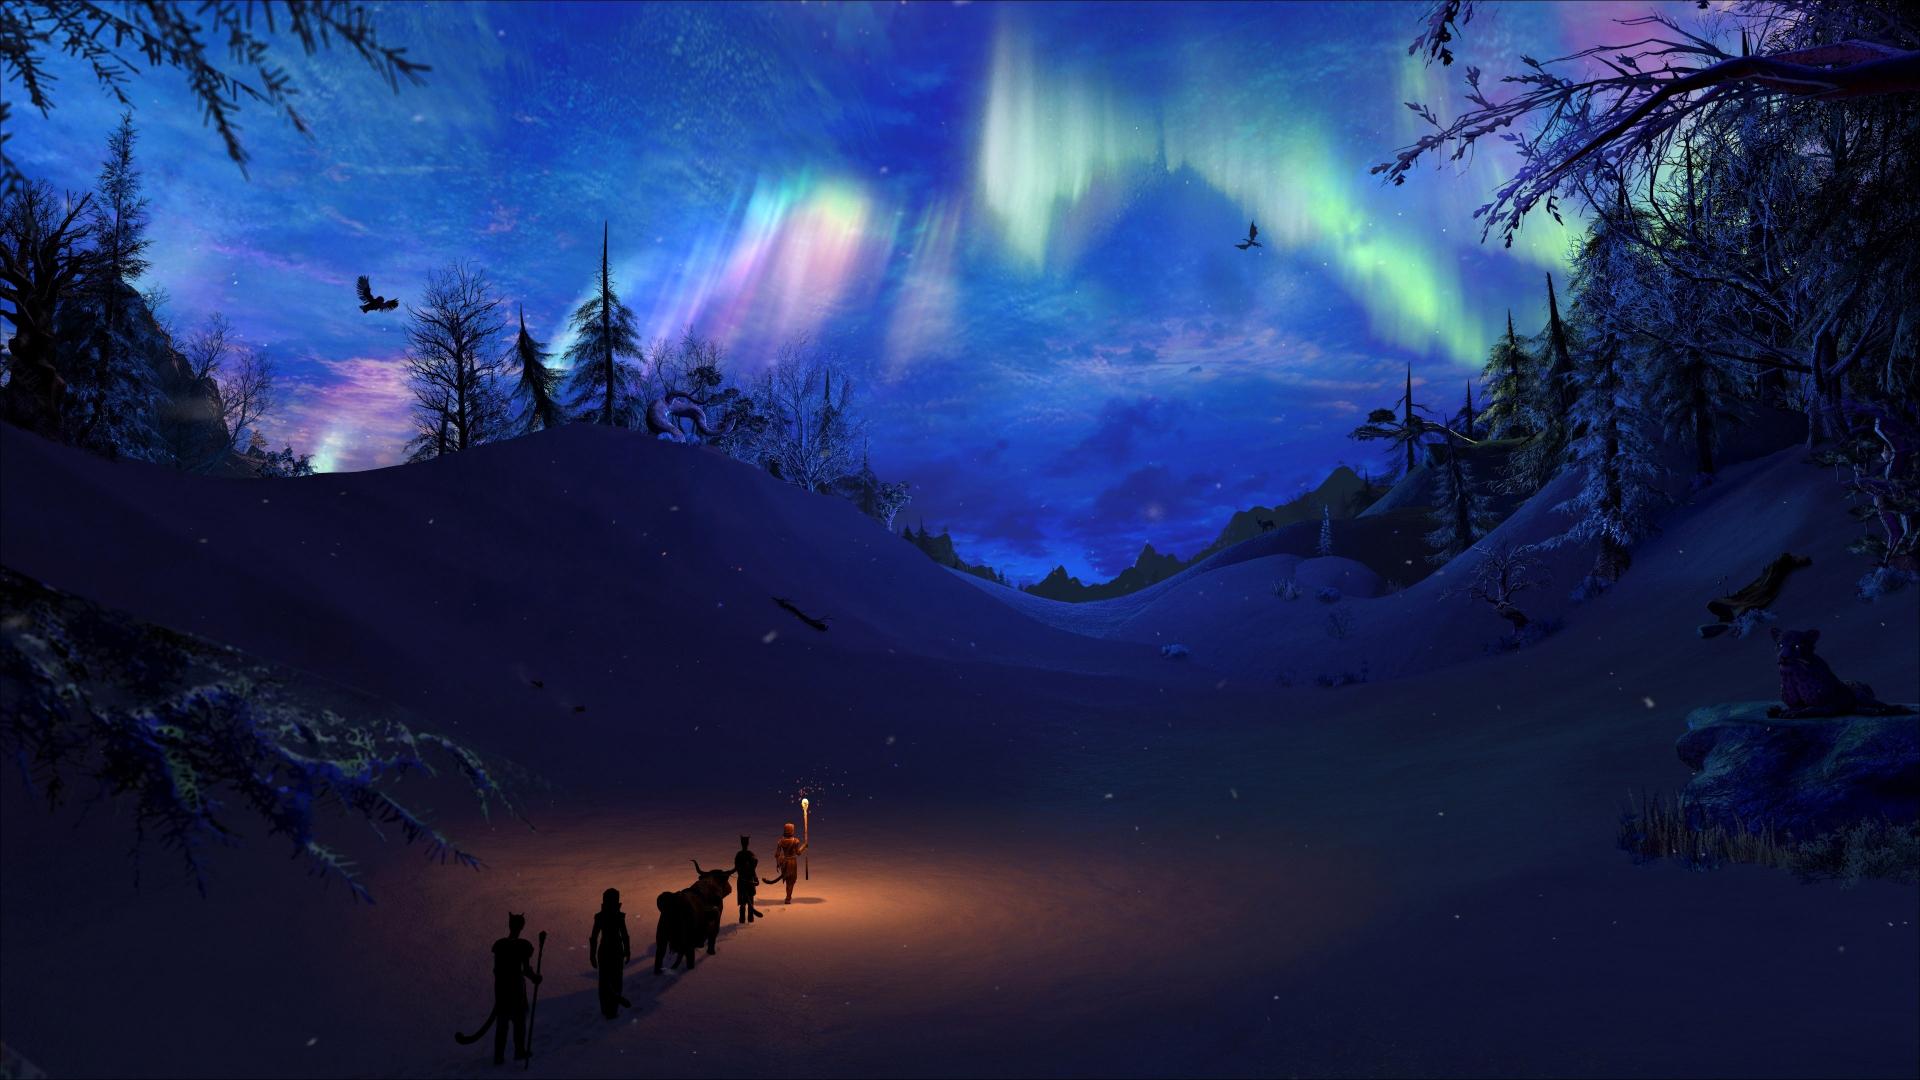 Download 1920x1080 Wallpaper Northern Lights Landscape The